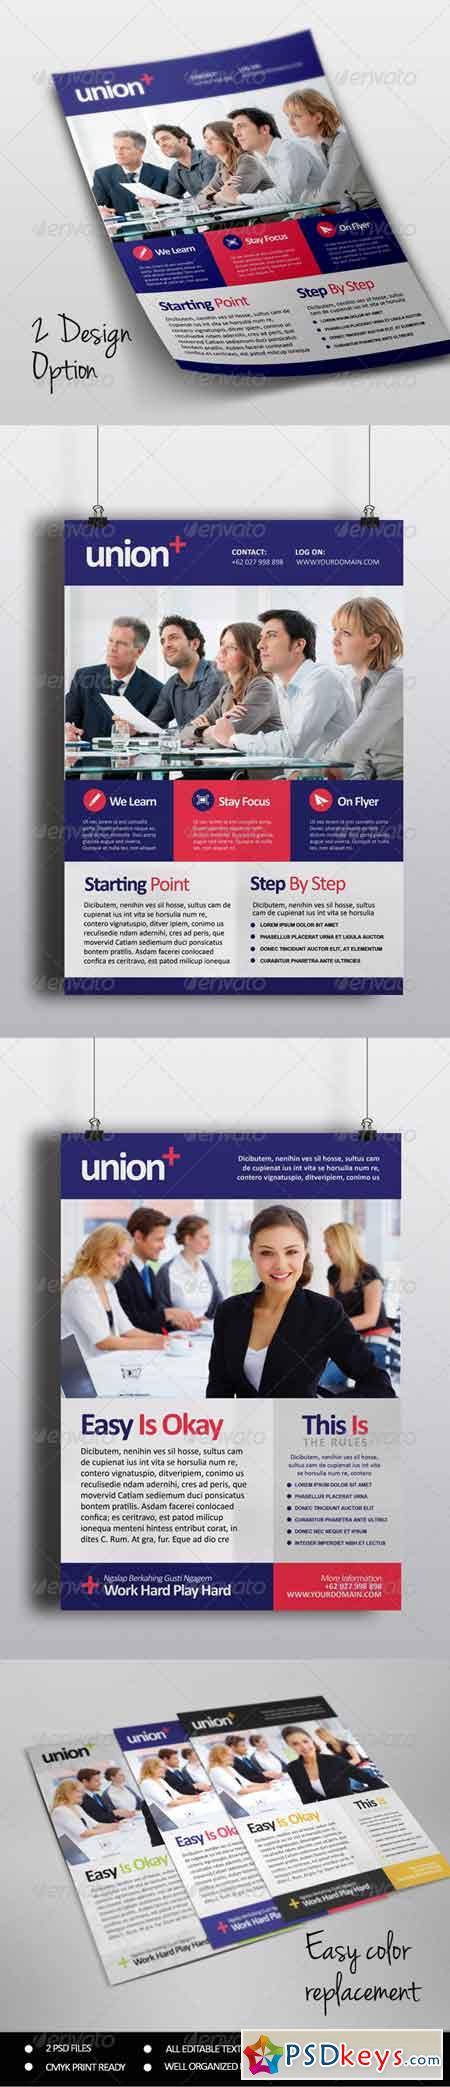 Union - Multipurpose Flyer Template 7137529